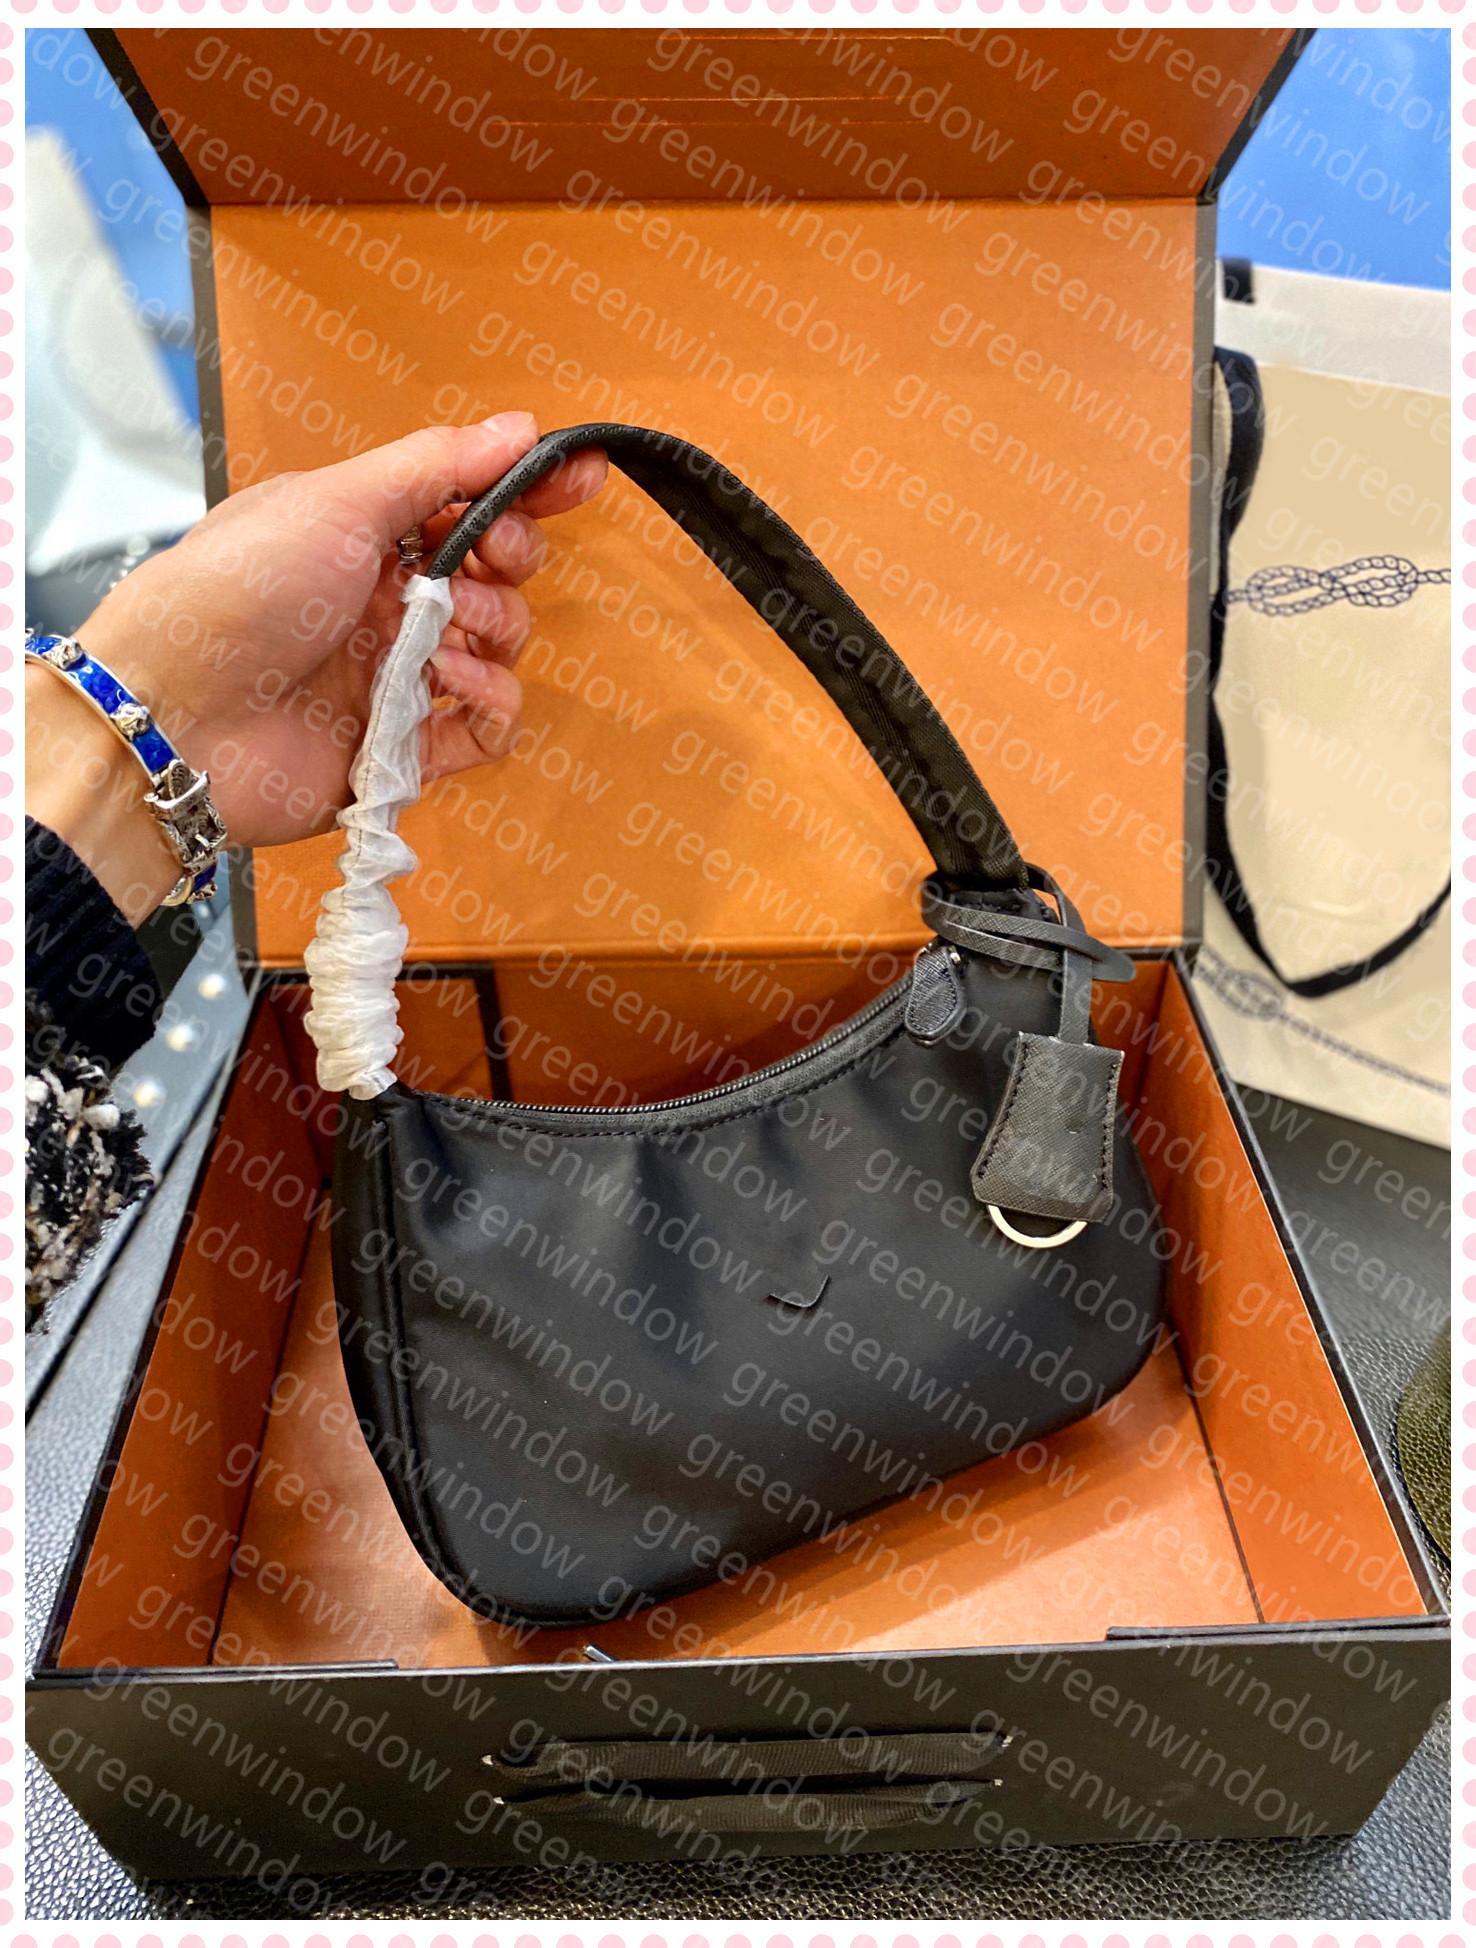 Pursards Luxurys Designers Sacs 2021 Hobo Sac Messenger Pochette 21030913DQ Mini épaule Femmes DQ Sac à main Femmes Lady Fashion Sac Crossbo PQTT